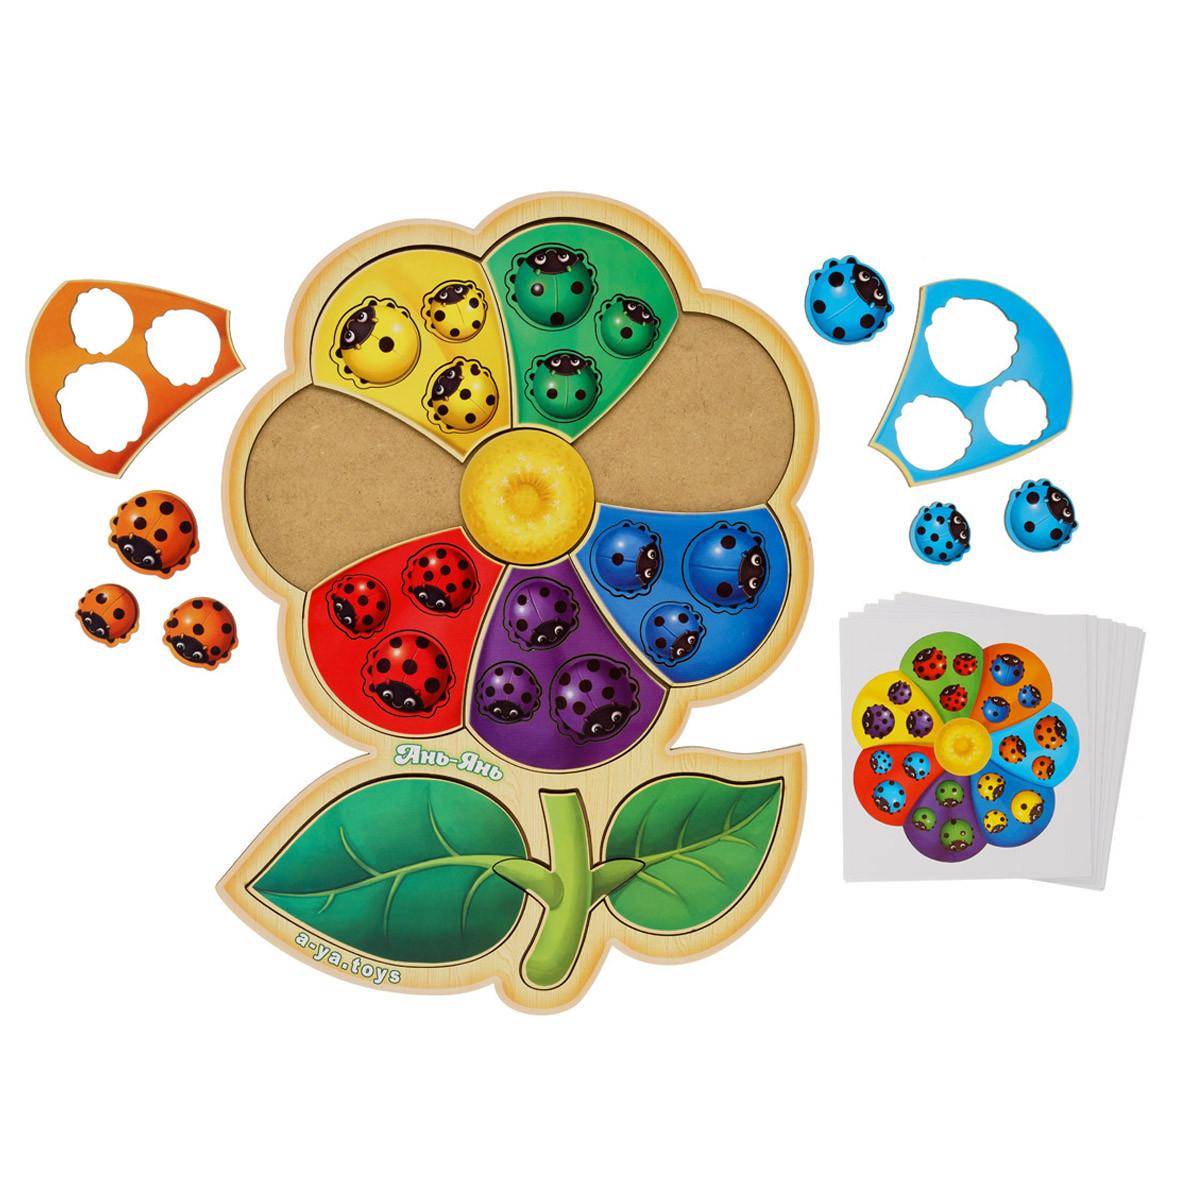 Пазл-сортер с карточками: Цветик-семицветик - 2